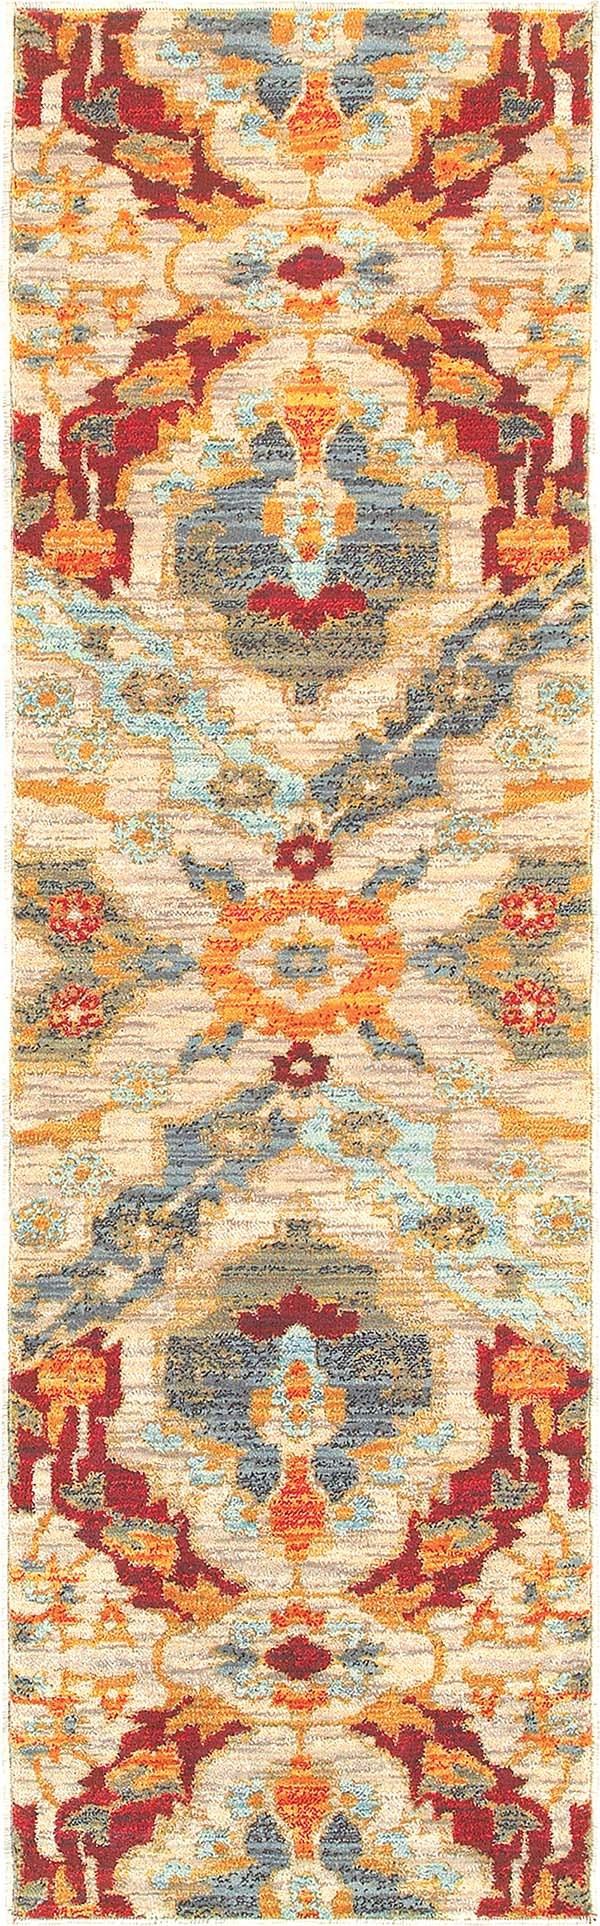 Oriental Weavers Sedona 6357a Rugs Rugs Direct